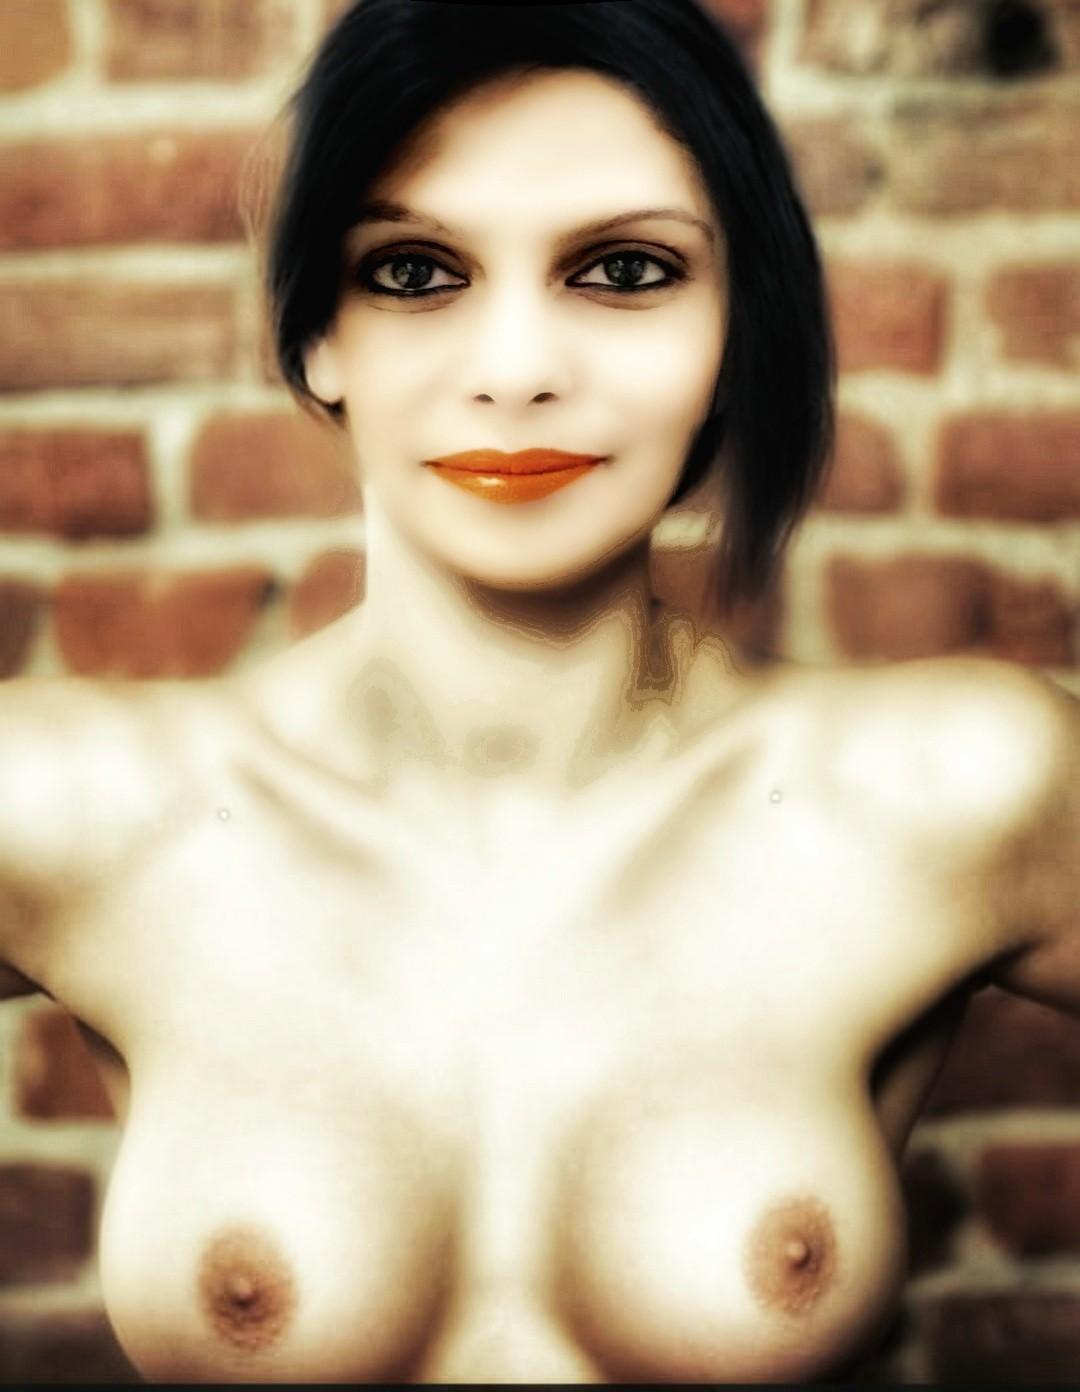 Palki Sharma Upadhyay small boobs journalist nude nipple pose without bra